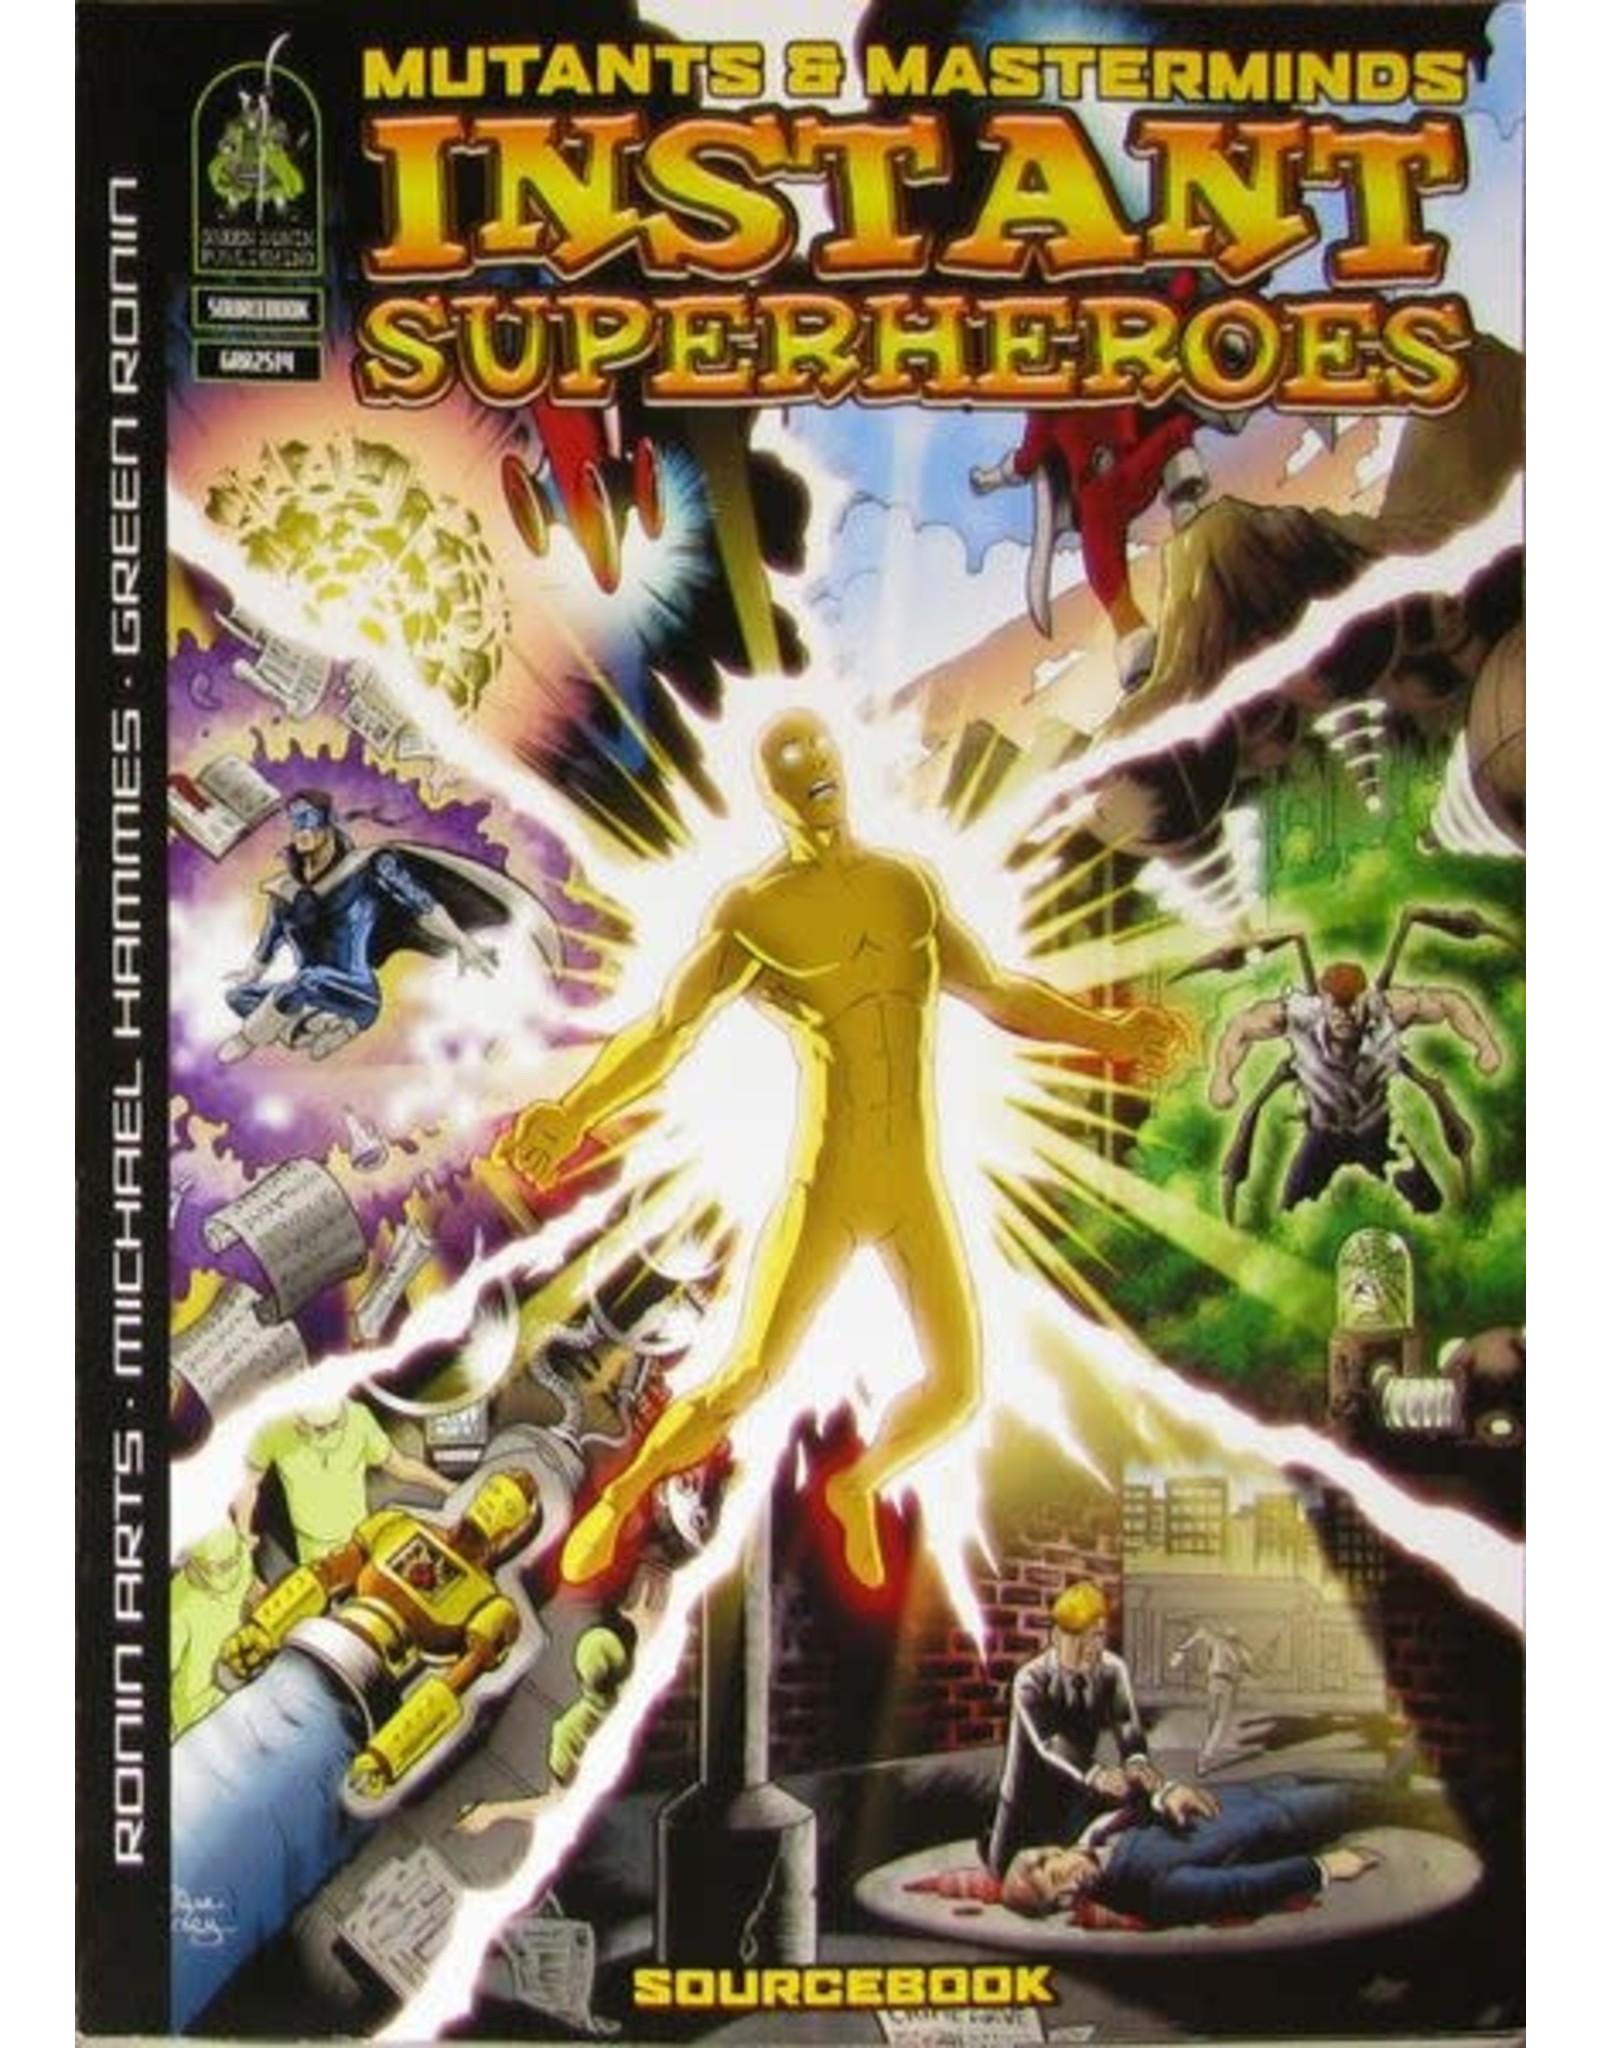 Green Ronin Publishing SALE - Mutants & Masterminds 2E: Instant Superheroes